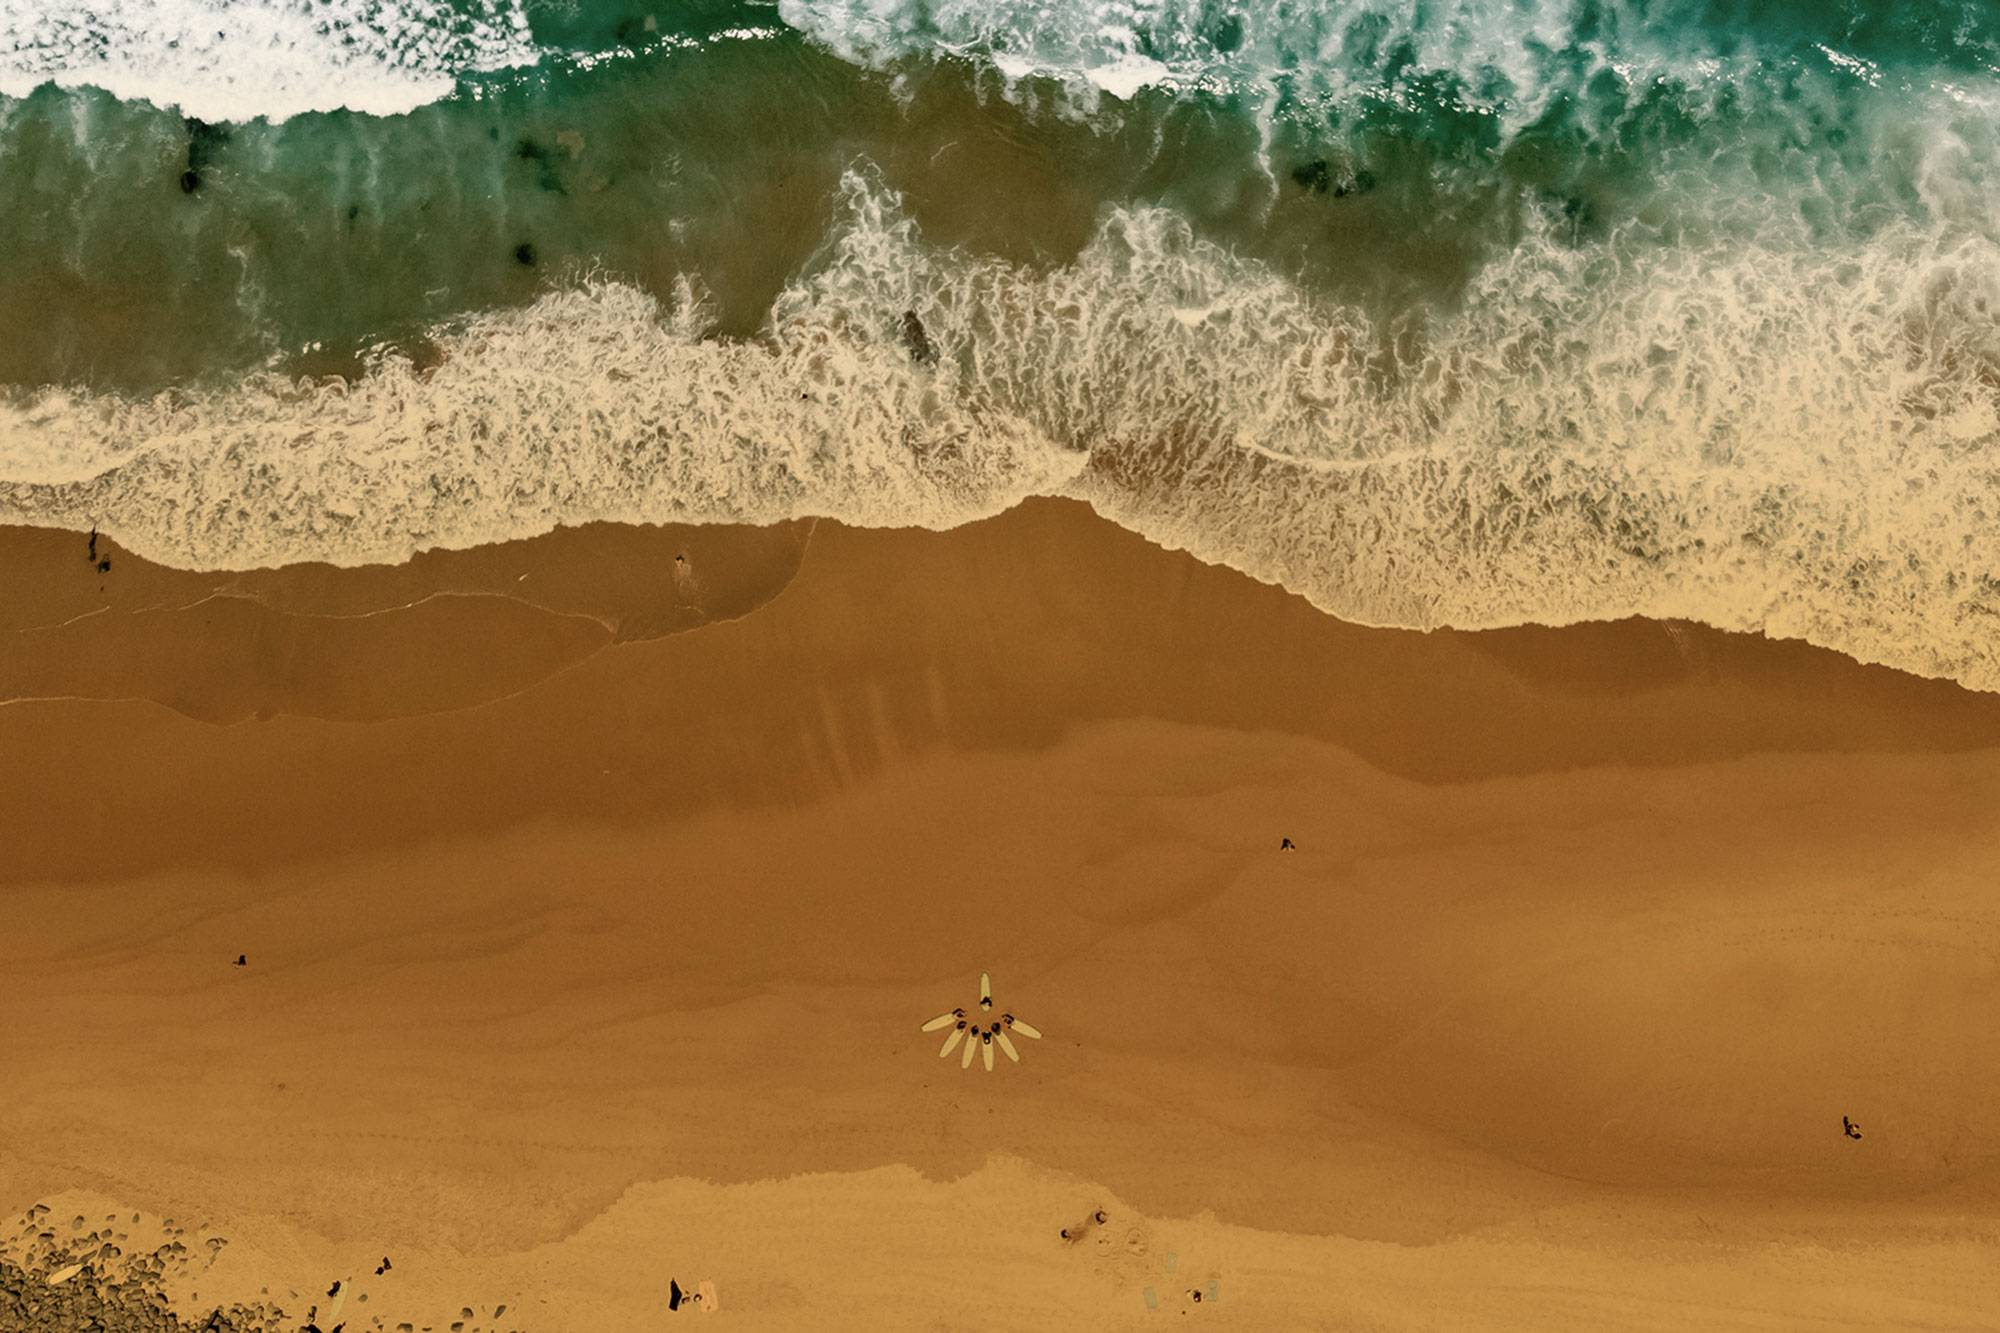 https://www.soulandsurf.com/wp-content/uploads/2021/07/retreatsportugal-imagesOceanSandSimWarren.jpg